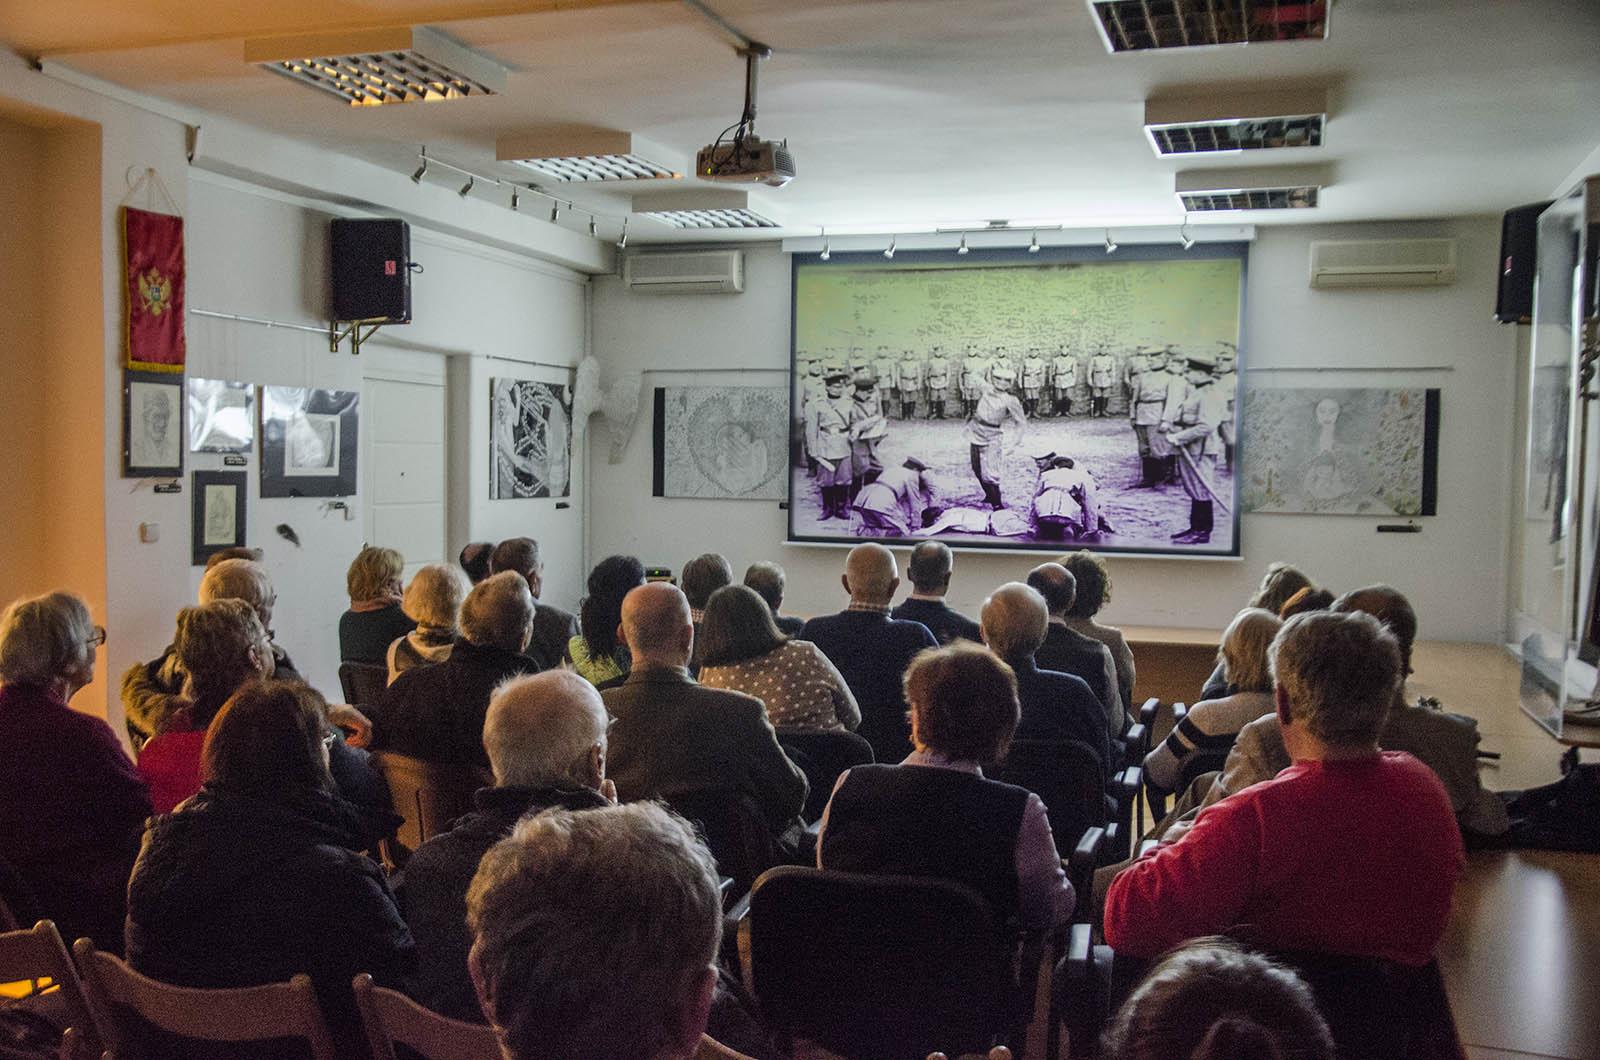 Projekcija Filma U Klubu Crnogoraca 5